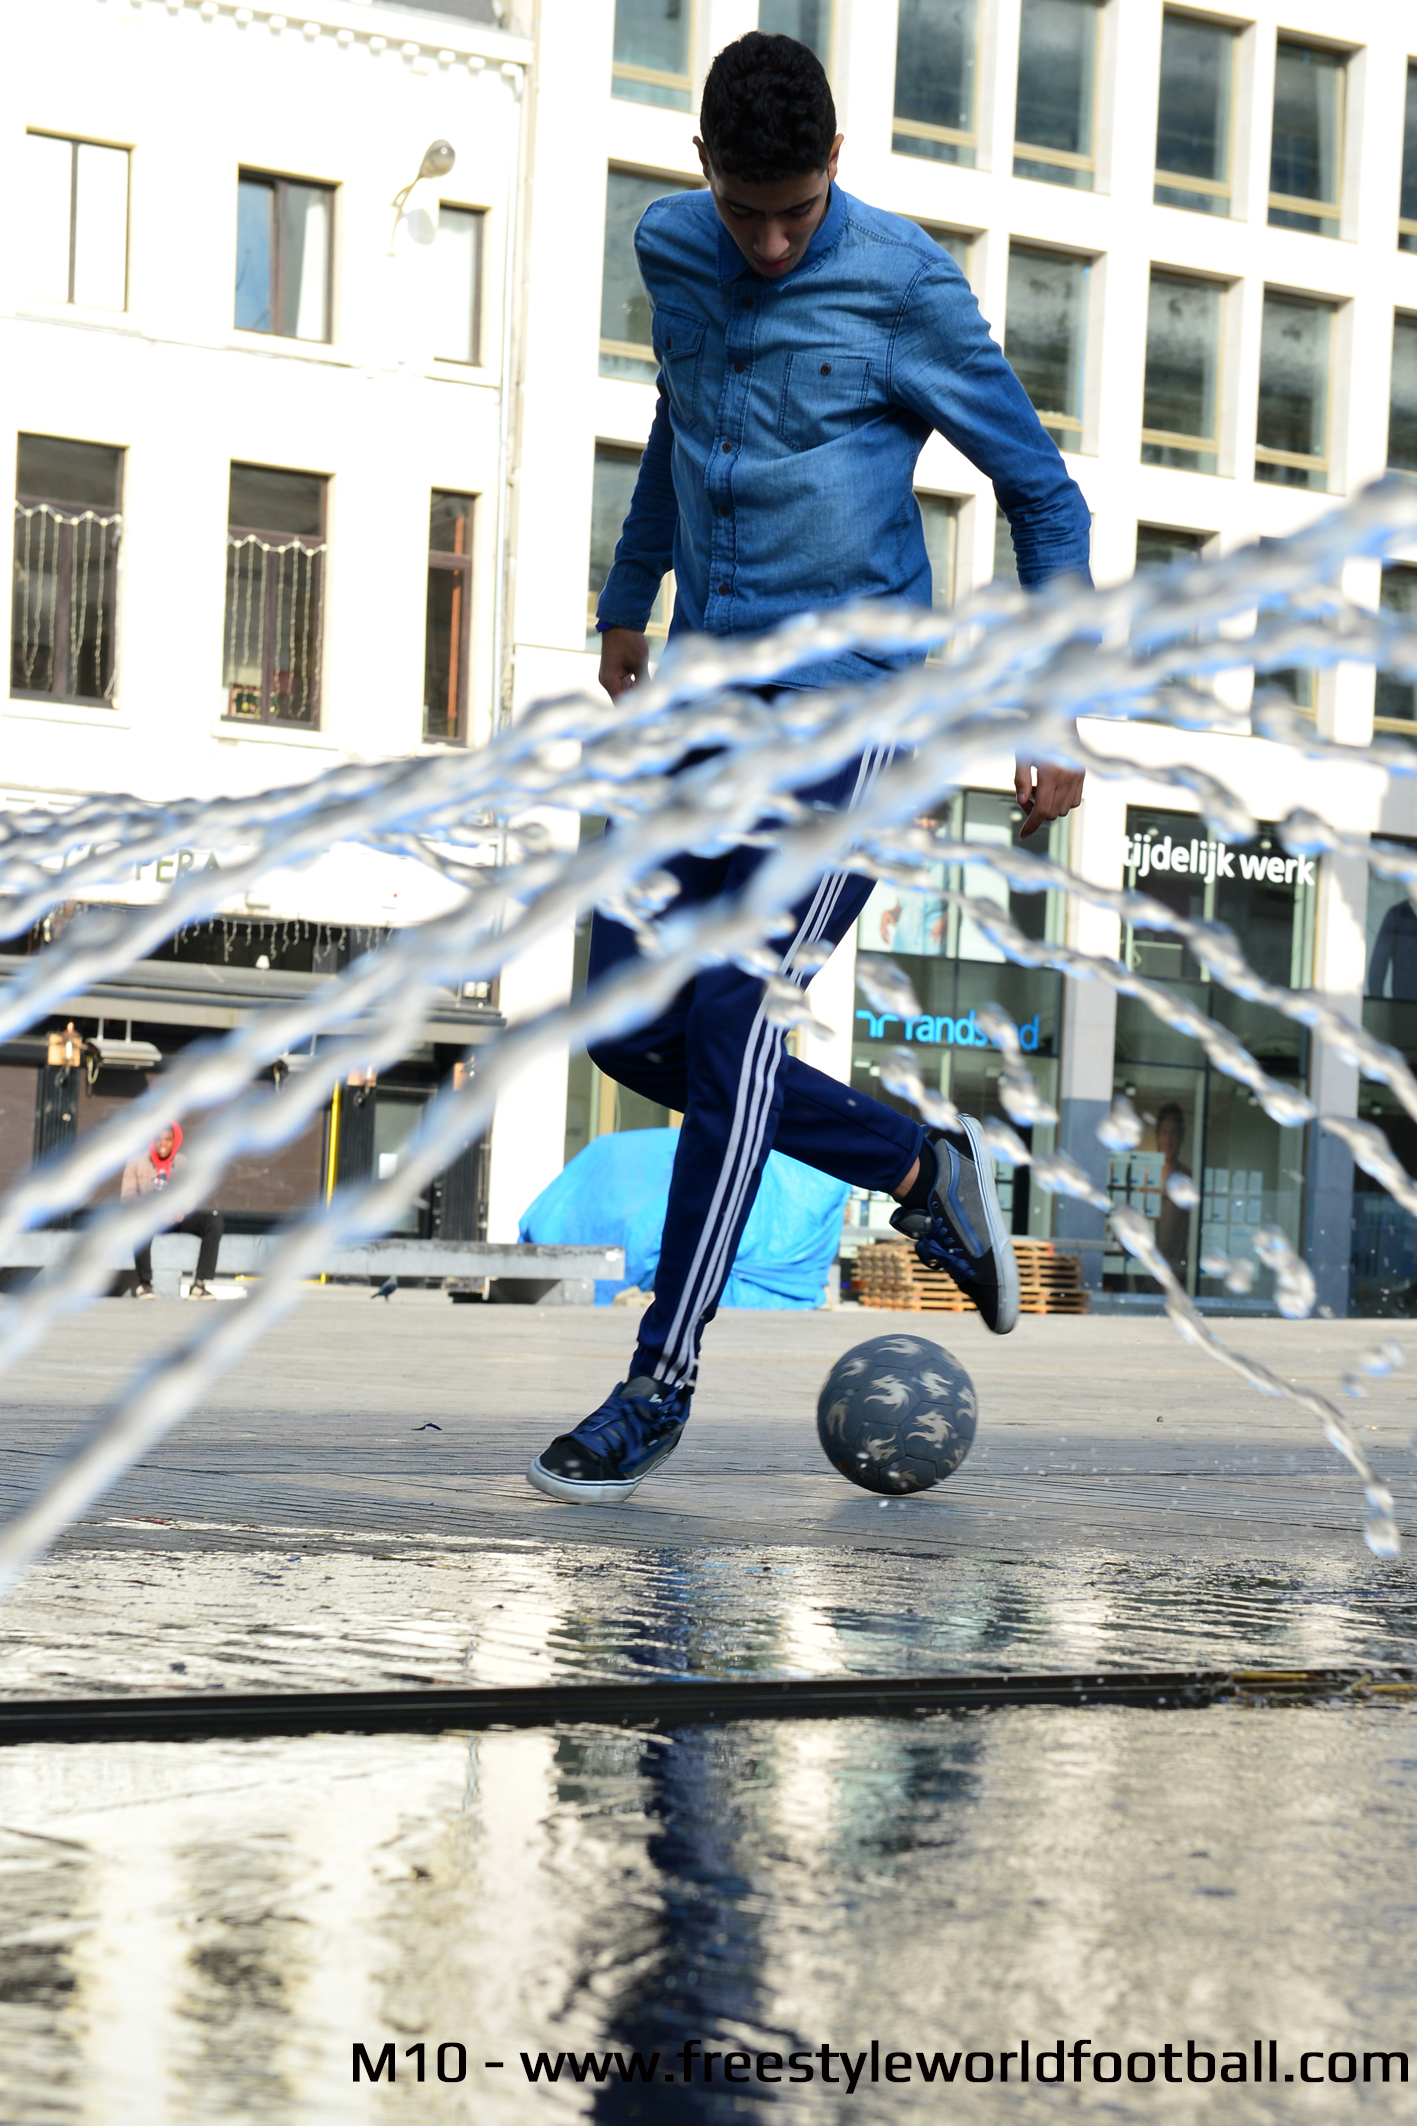 M10 - 001 - www.freestyleworldfootball.com.jpg